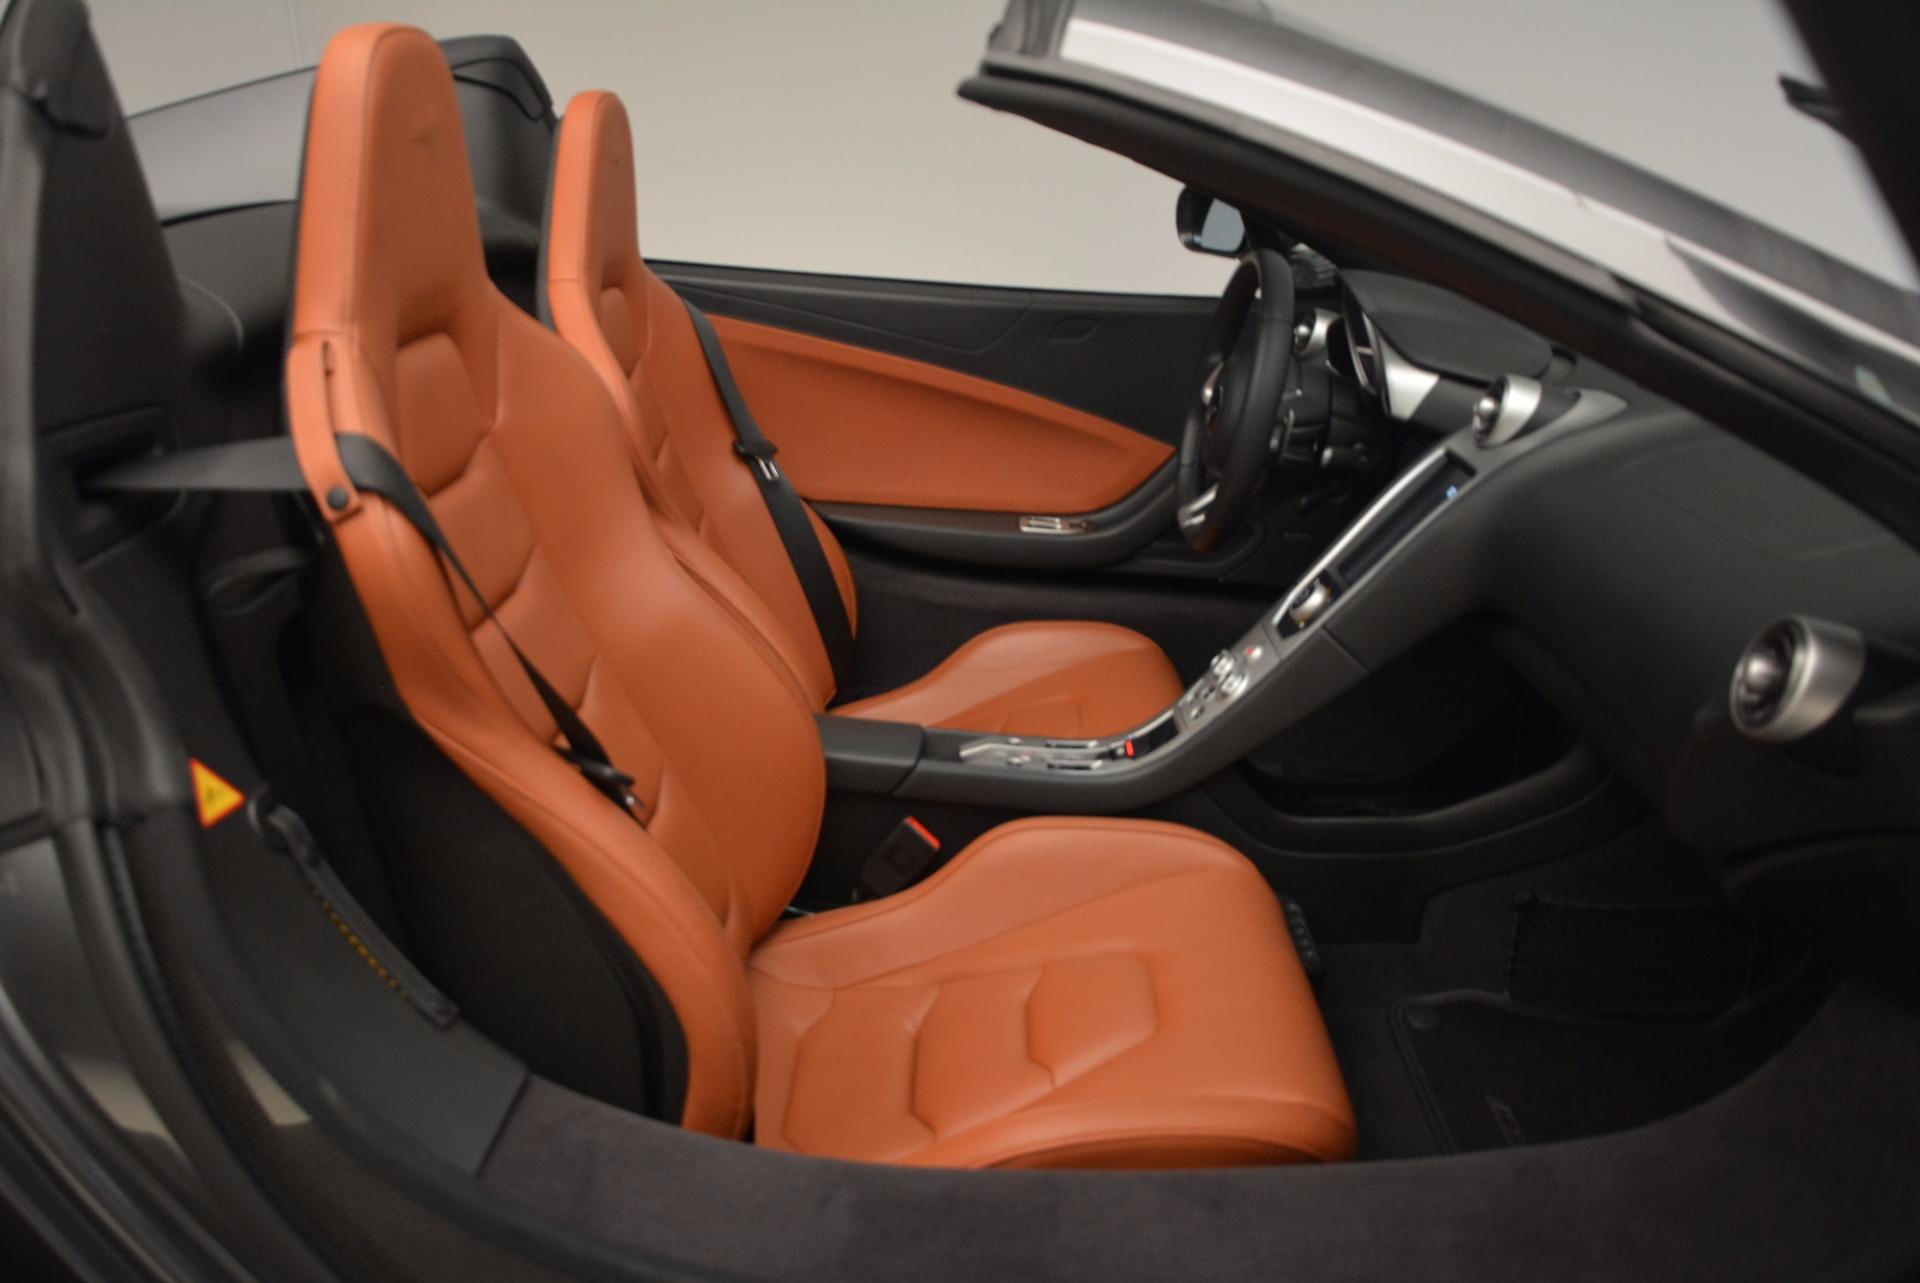 Used 2014 McLaren MP4-12C Spider  For Sale In Westport, CT 1510_p34